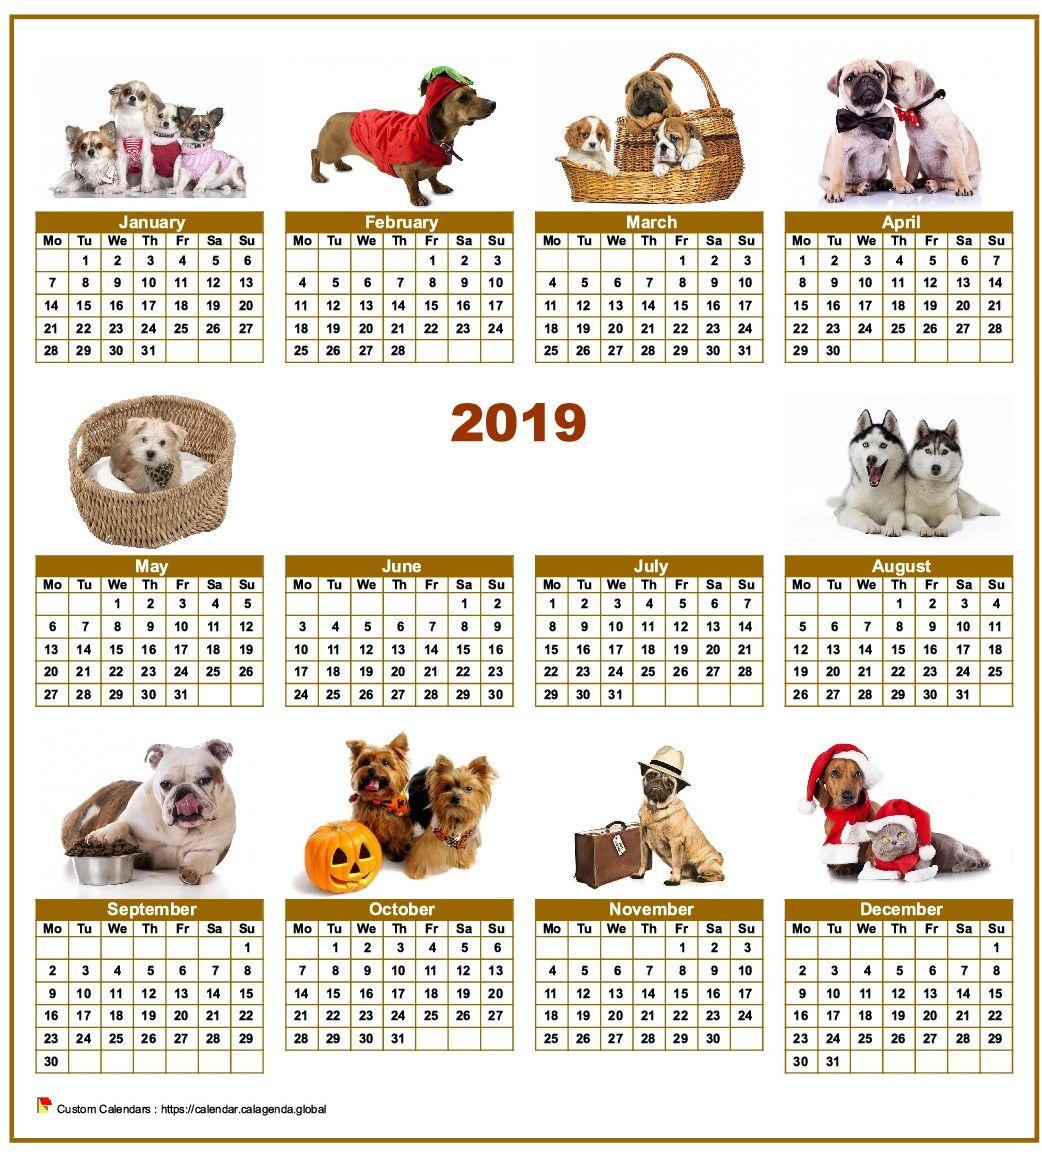 Calendar 2019 annual special 'dogs ' with 10 photos